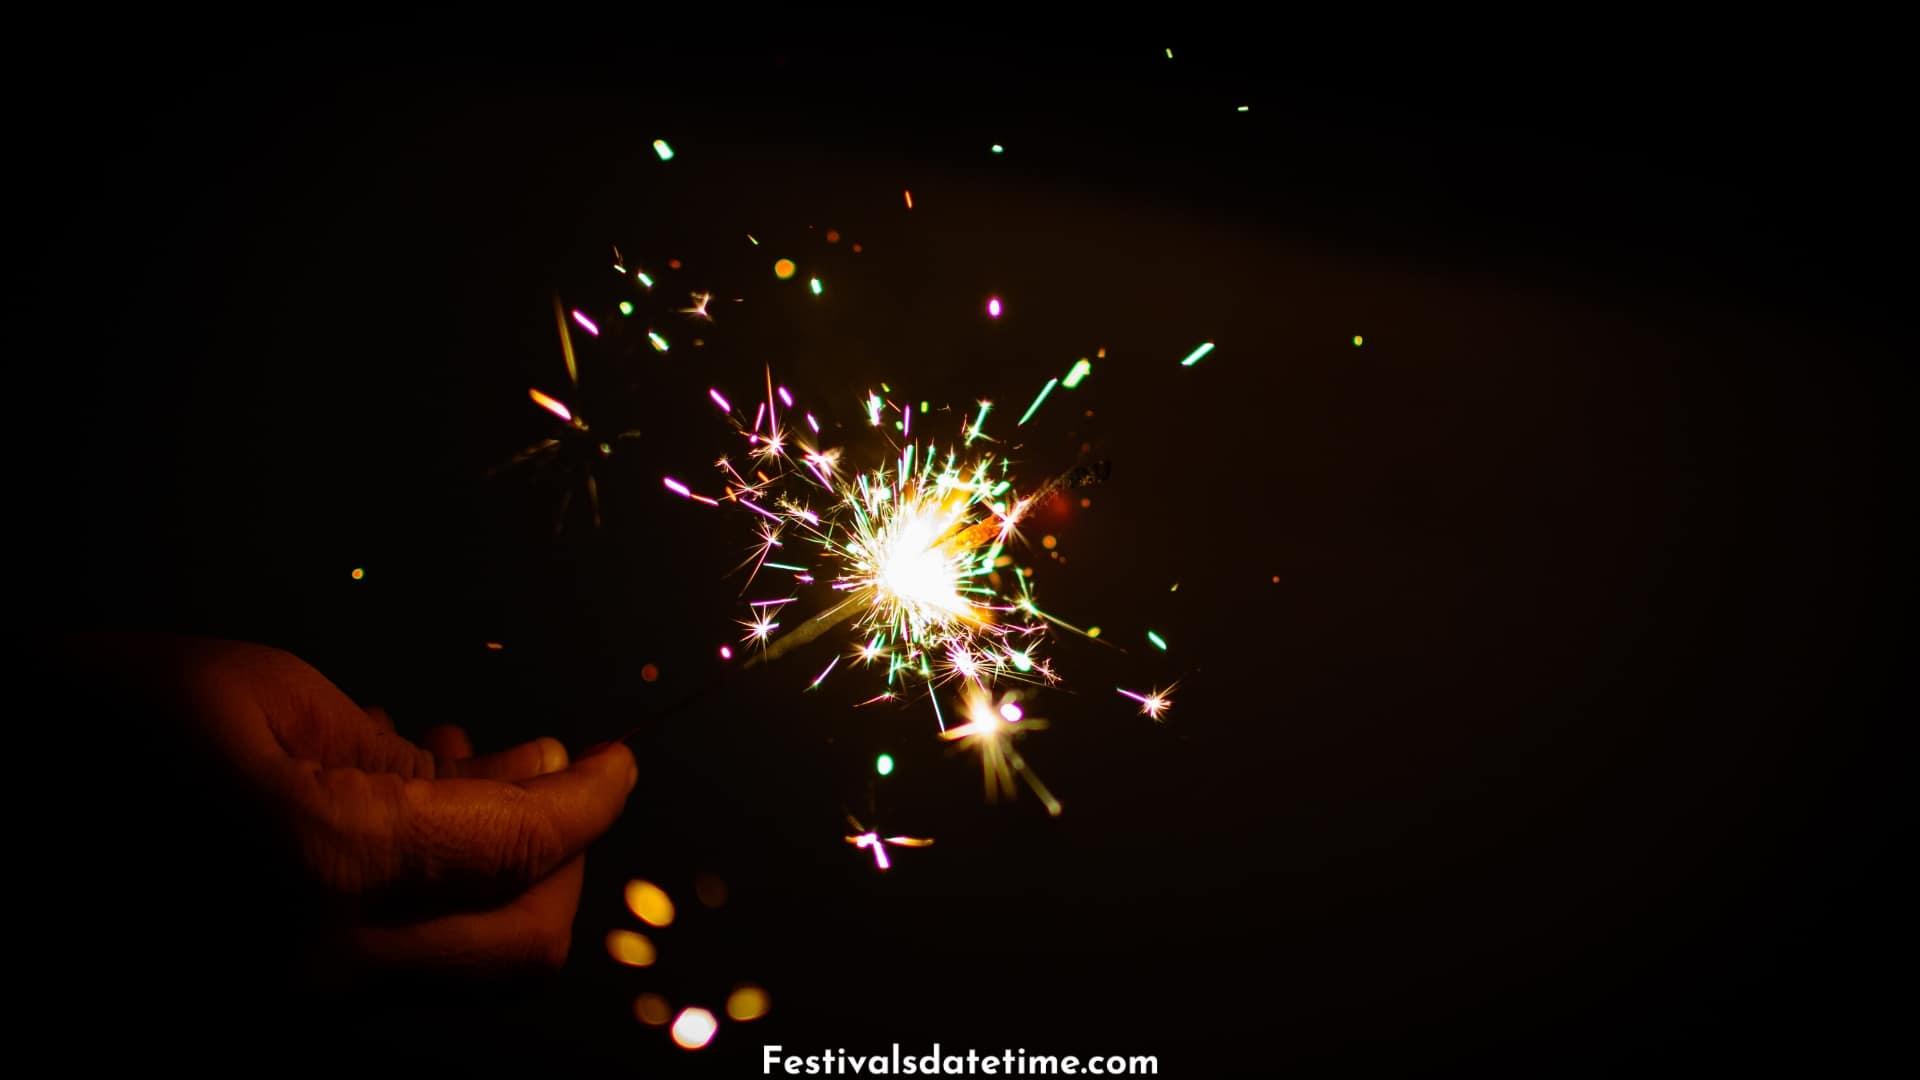 diwali_background_hd_images